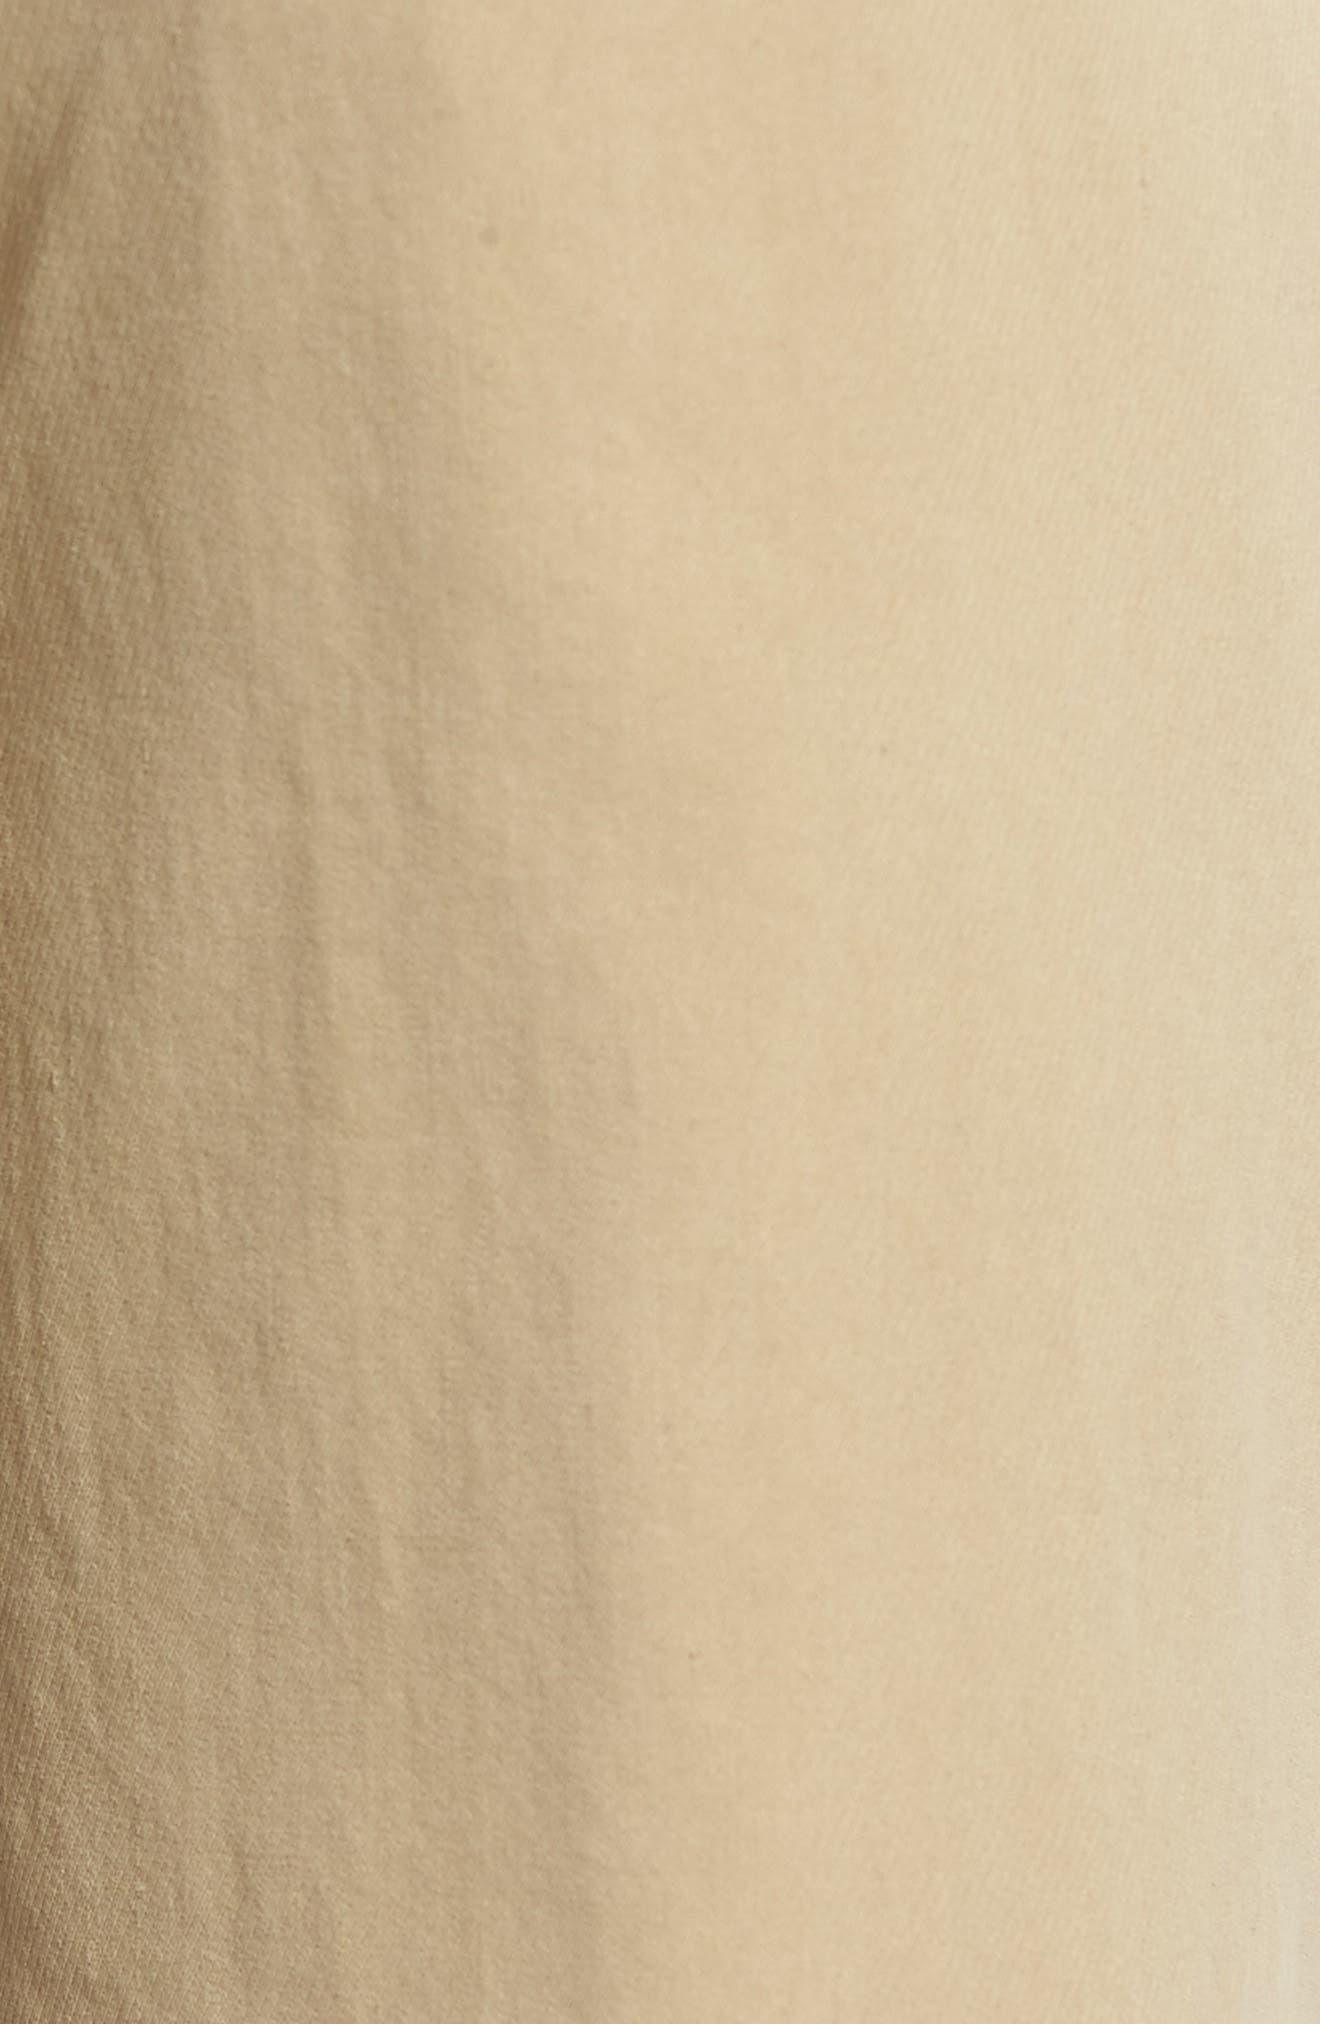 St. Thomas Pleated Shorts,                             Alternate thumbnail 23, color,